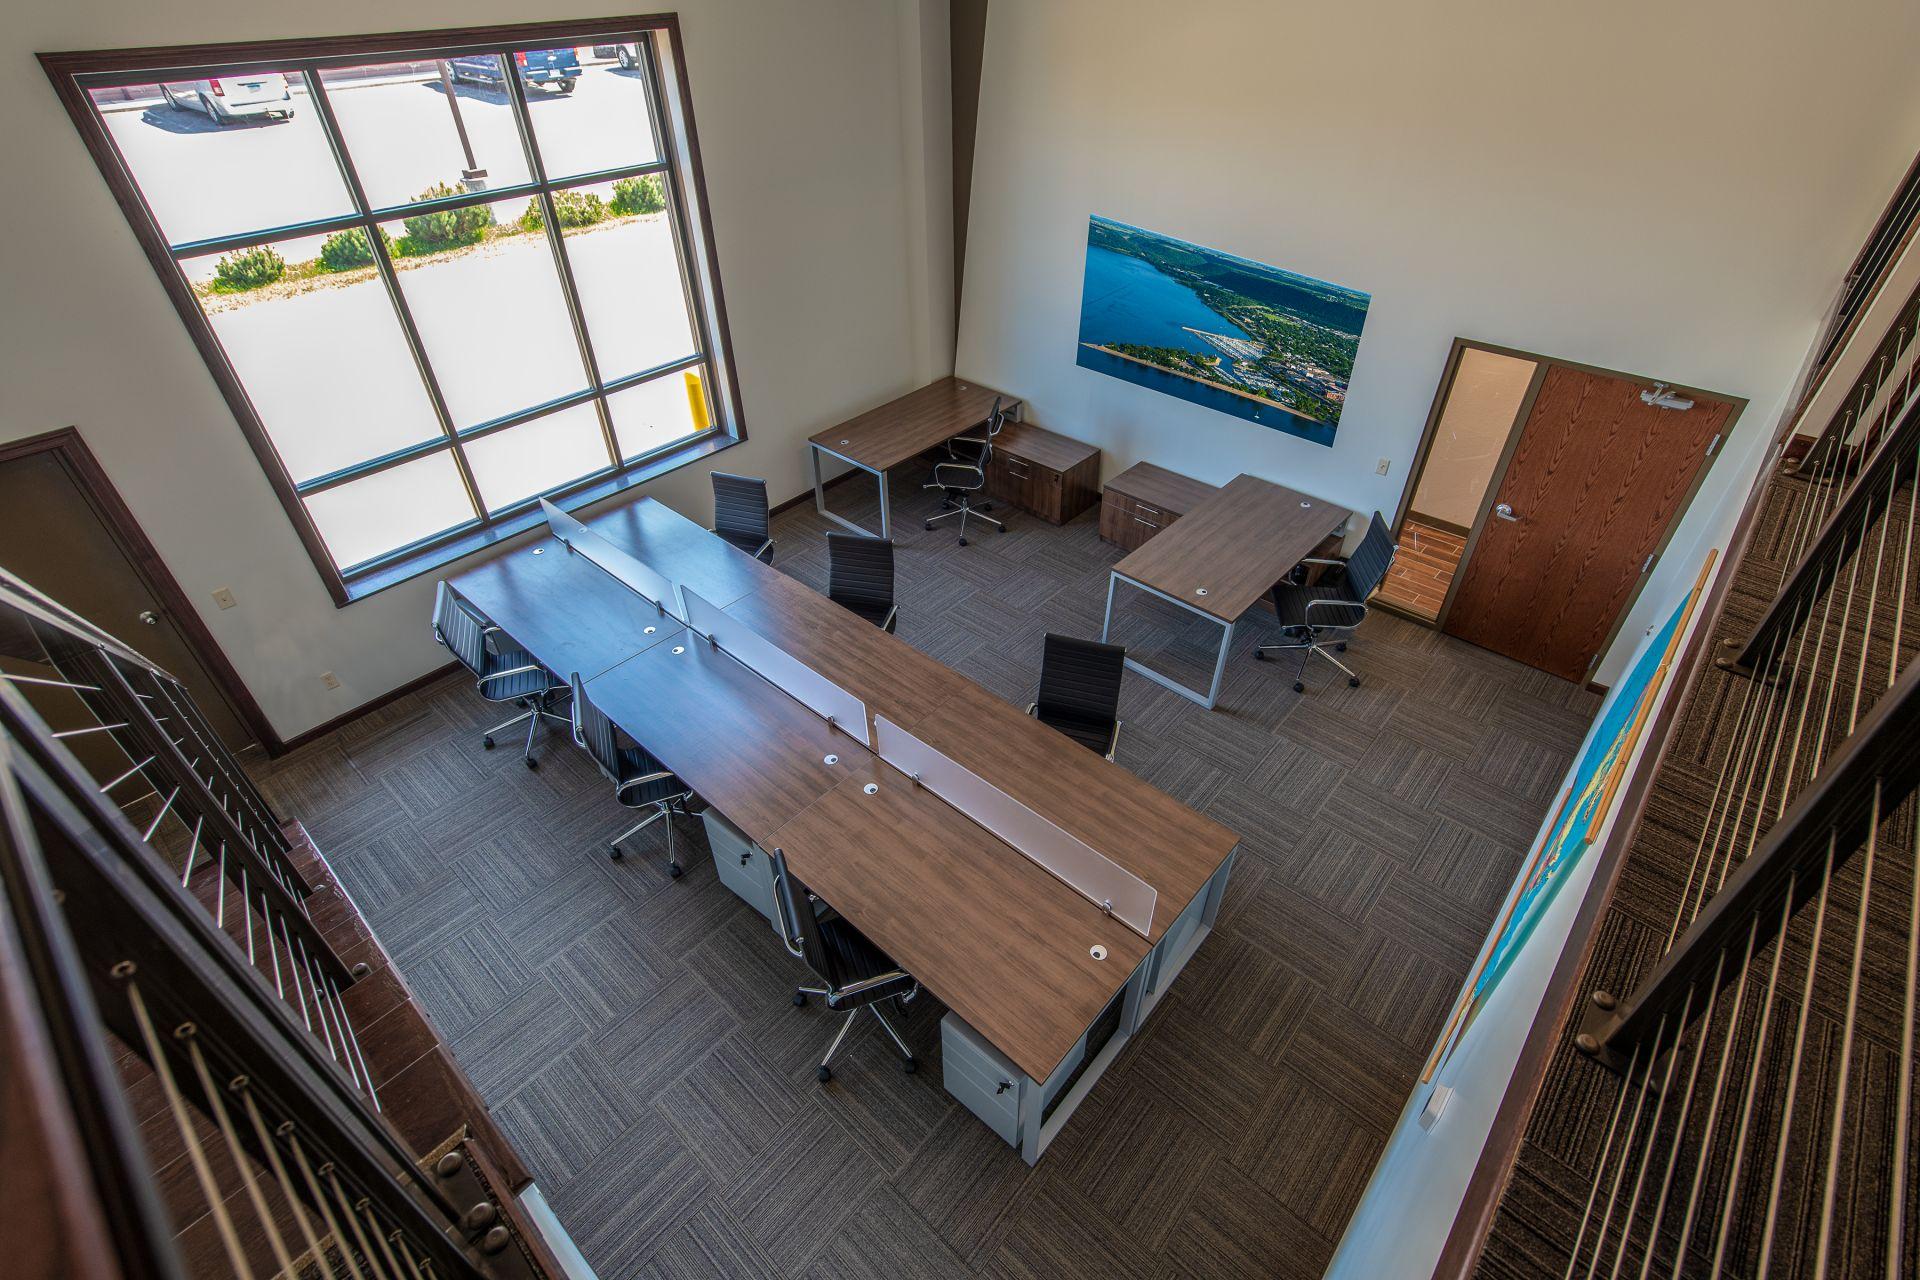 Lake City Business Center, Lake City